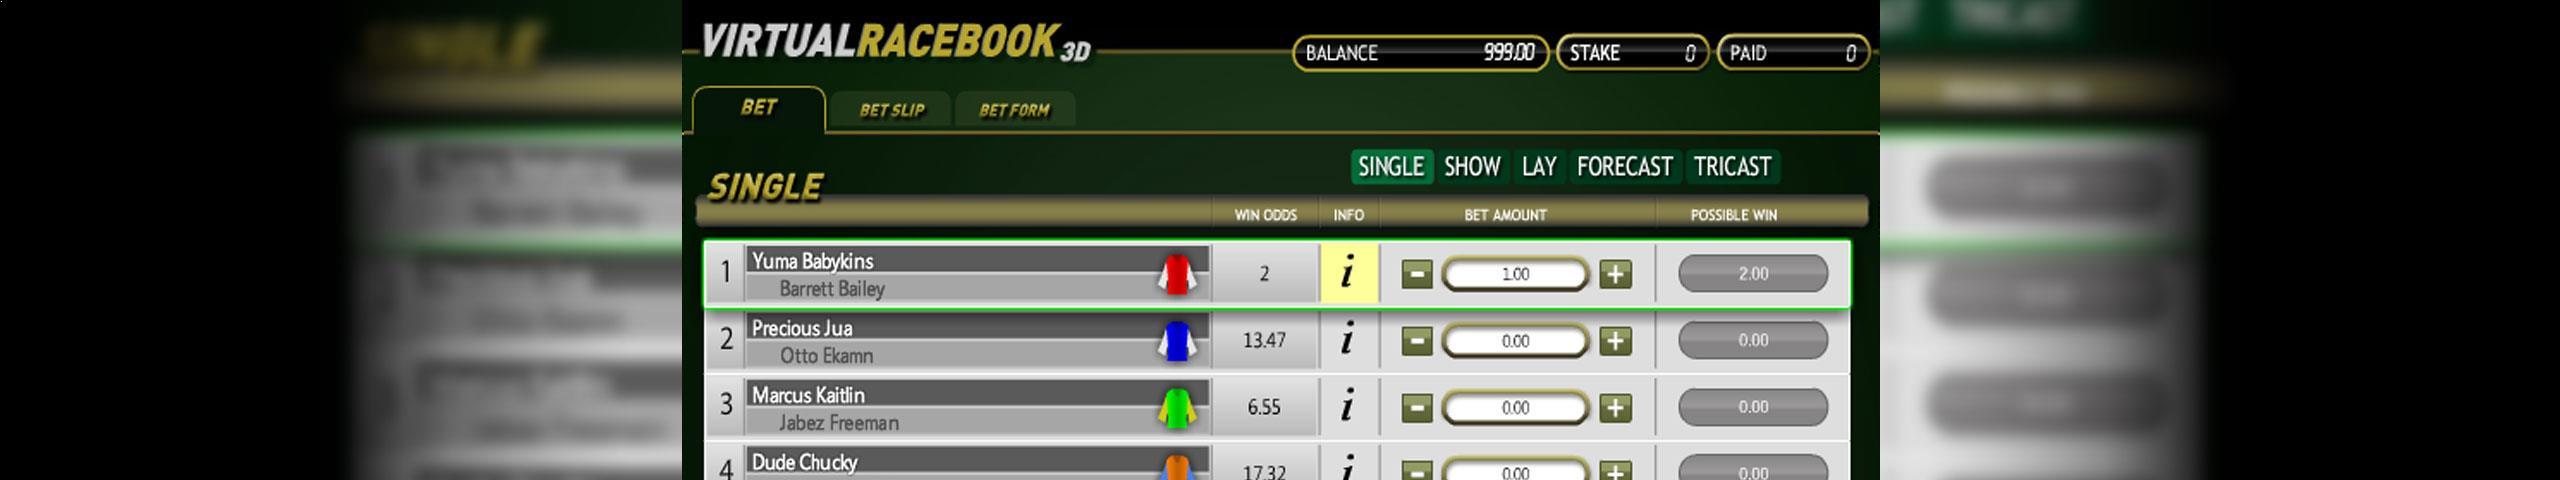 Virtual Racebook 3D Betsoft jocuri slot slider